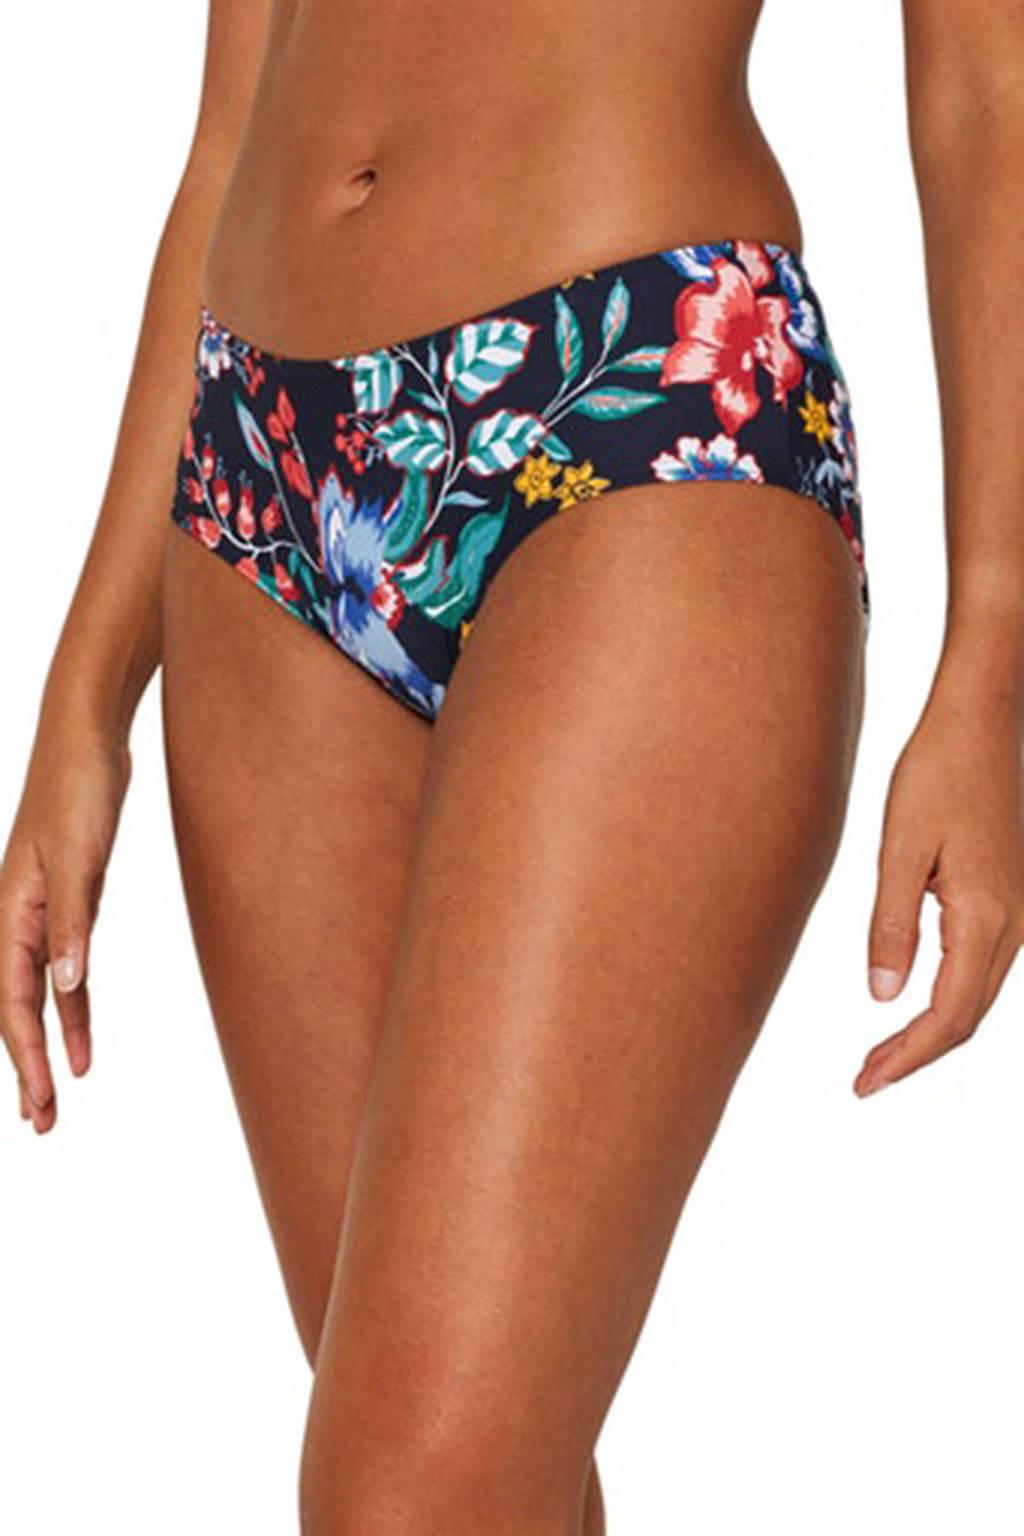 ESPRIT Women Beach gebloemd bikinibroekje donkerblauw, Donkerblauw/geel/rood